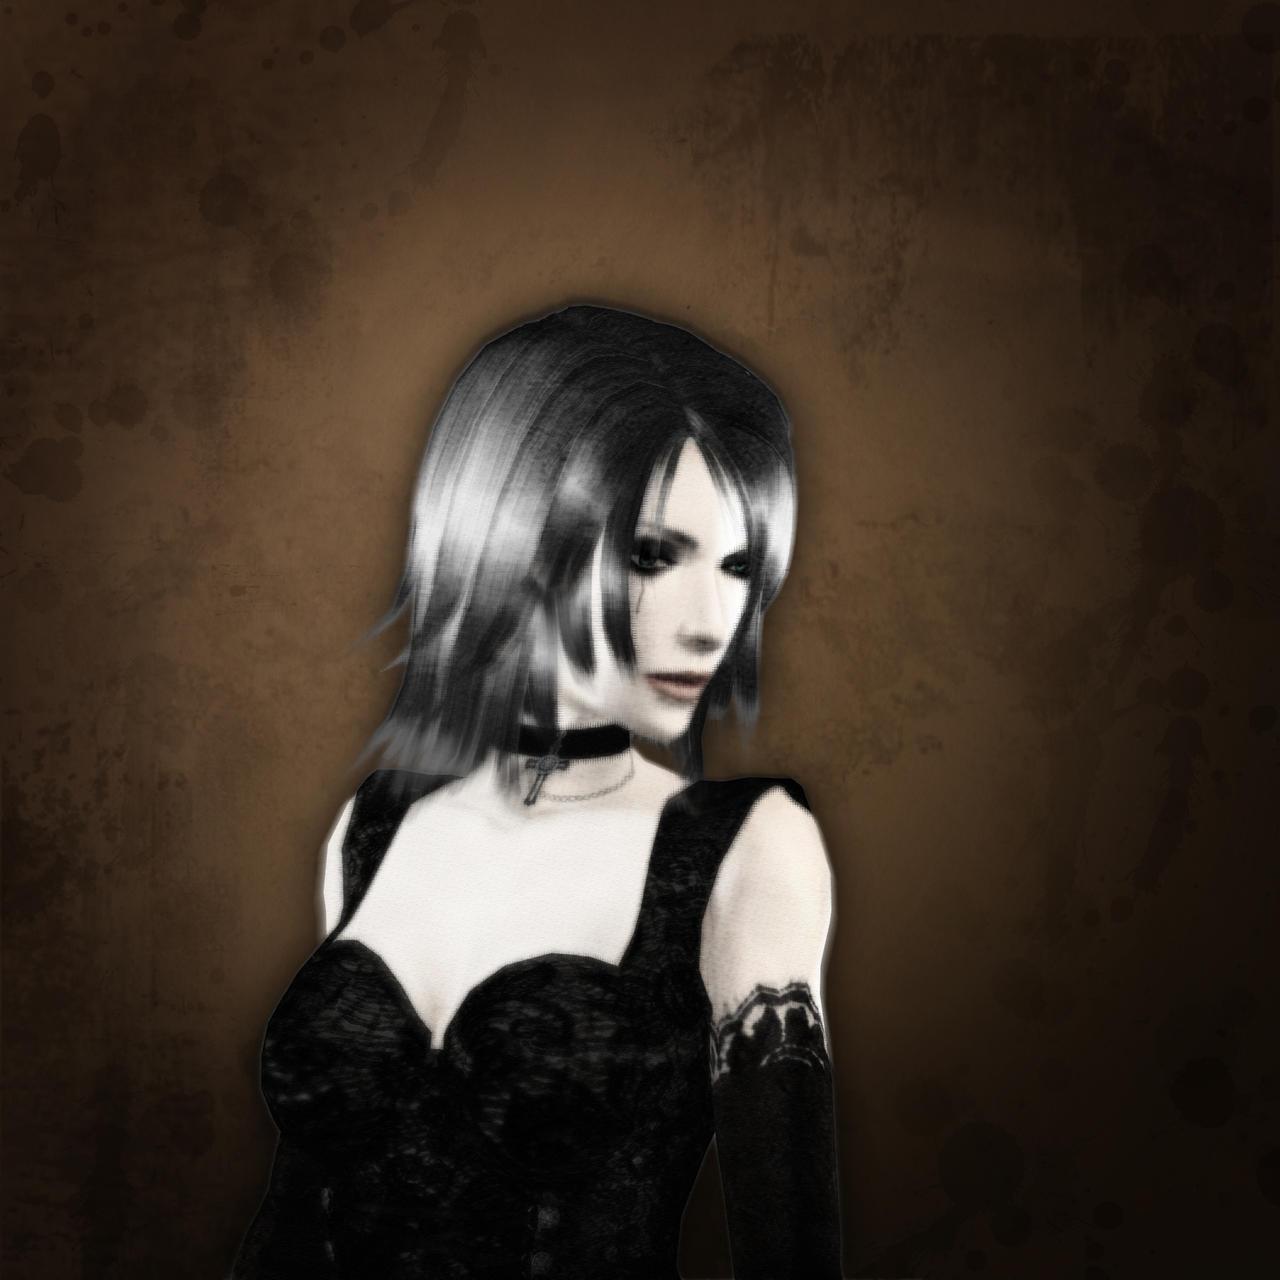 Goth by poker15